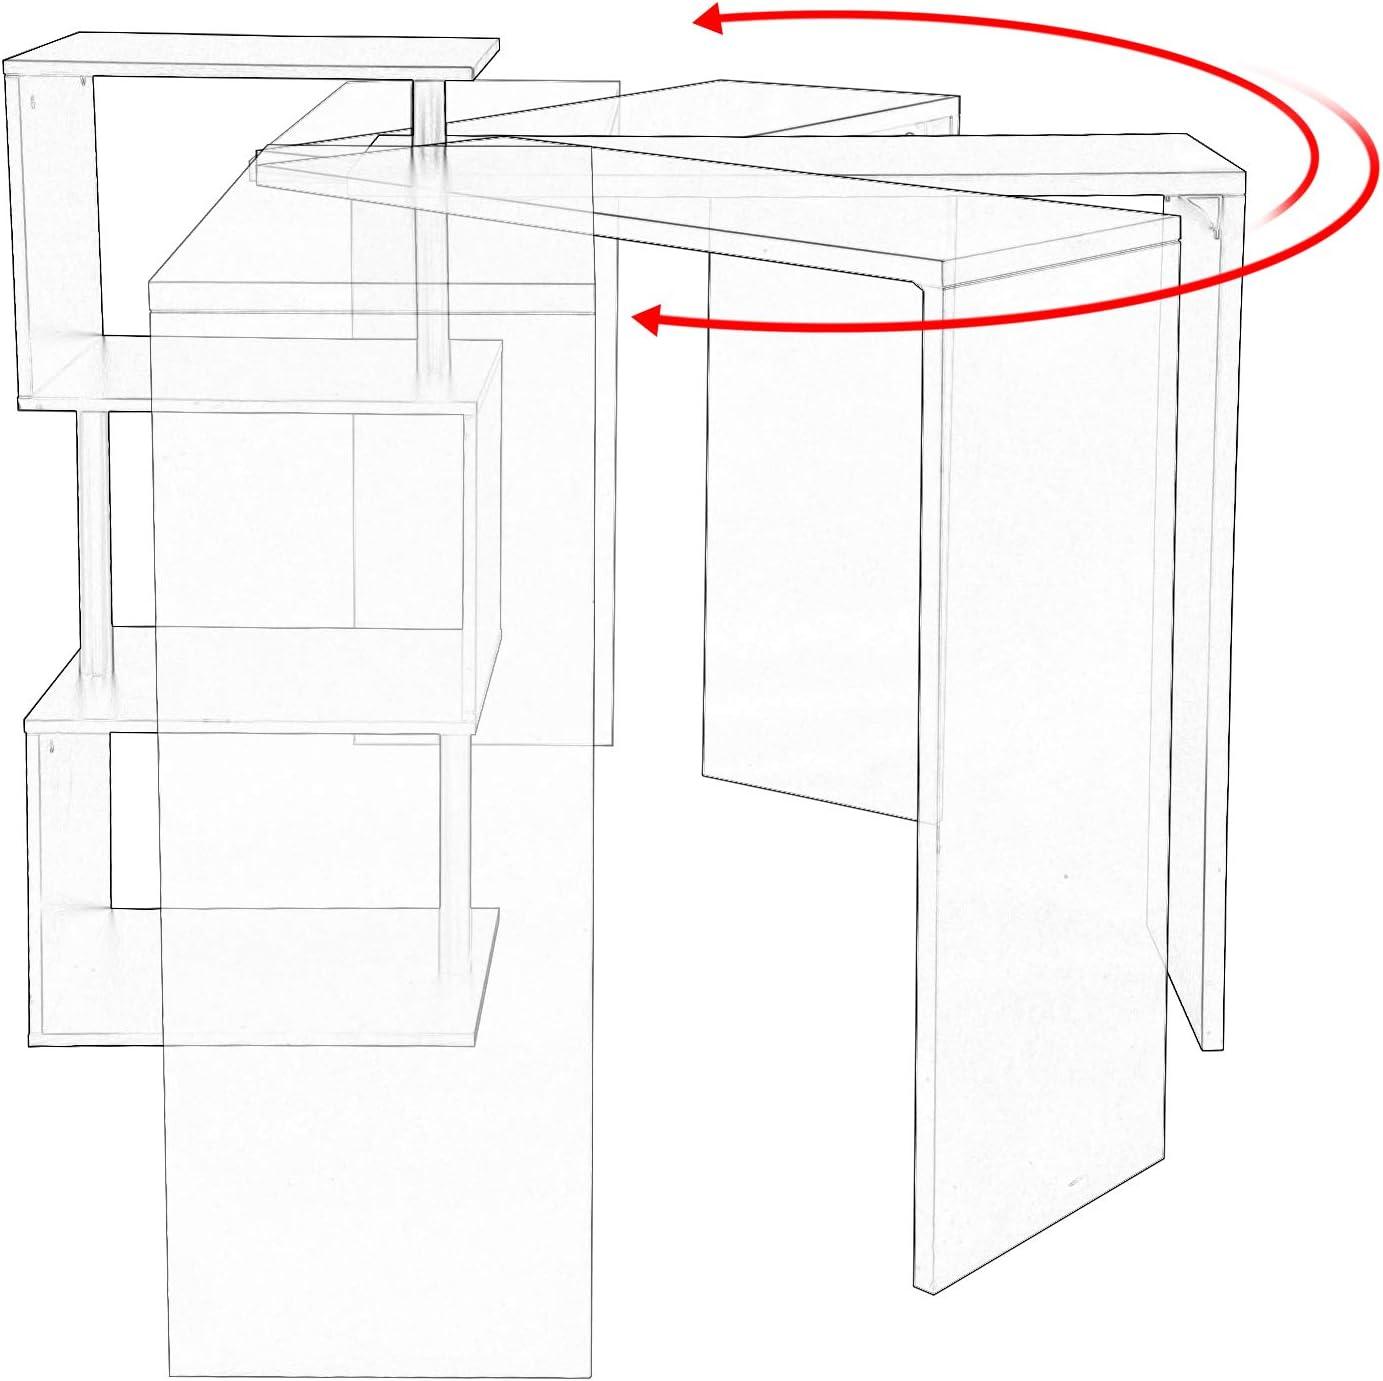 WxDxH Giratorio Estructura de Metal Roble Claro BT27hei MDF WOLTU Mesa de Bar Mesa de Bistro Mesa de Comedor con 3 Estantes 134x38x112cm